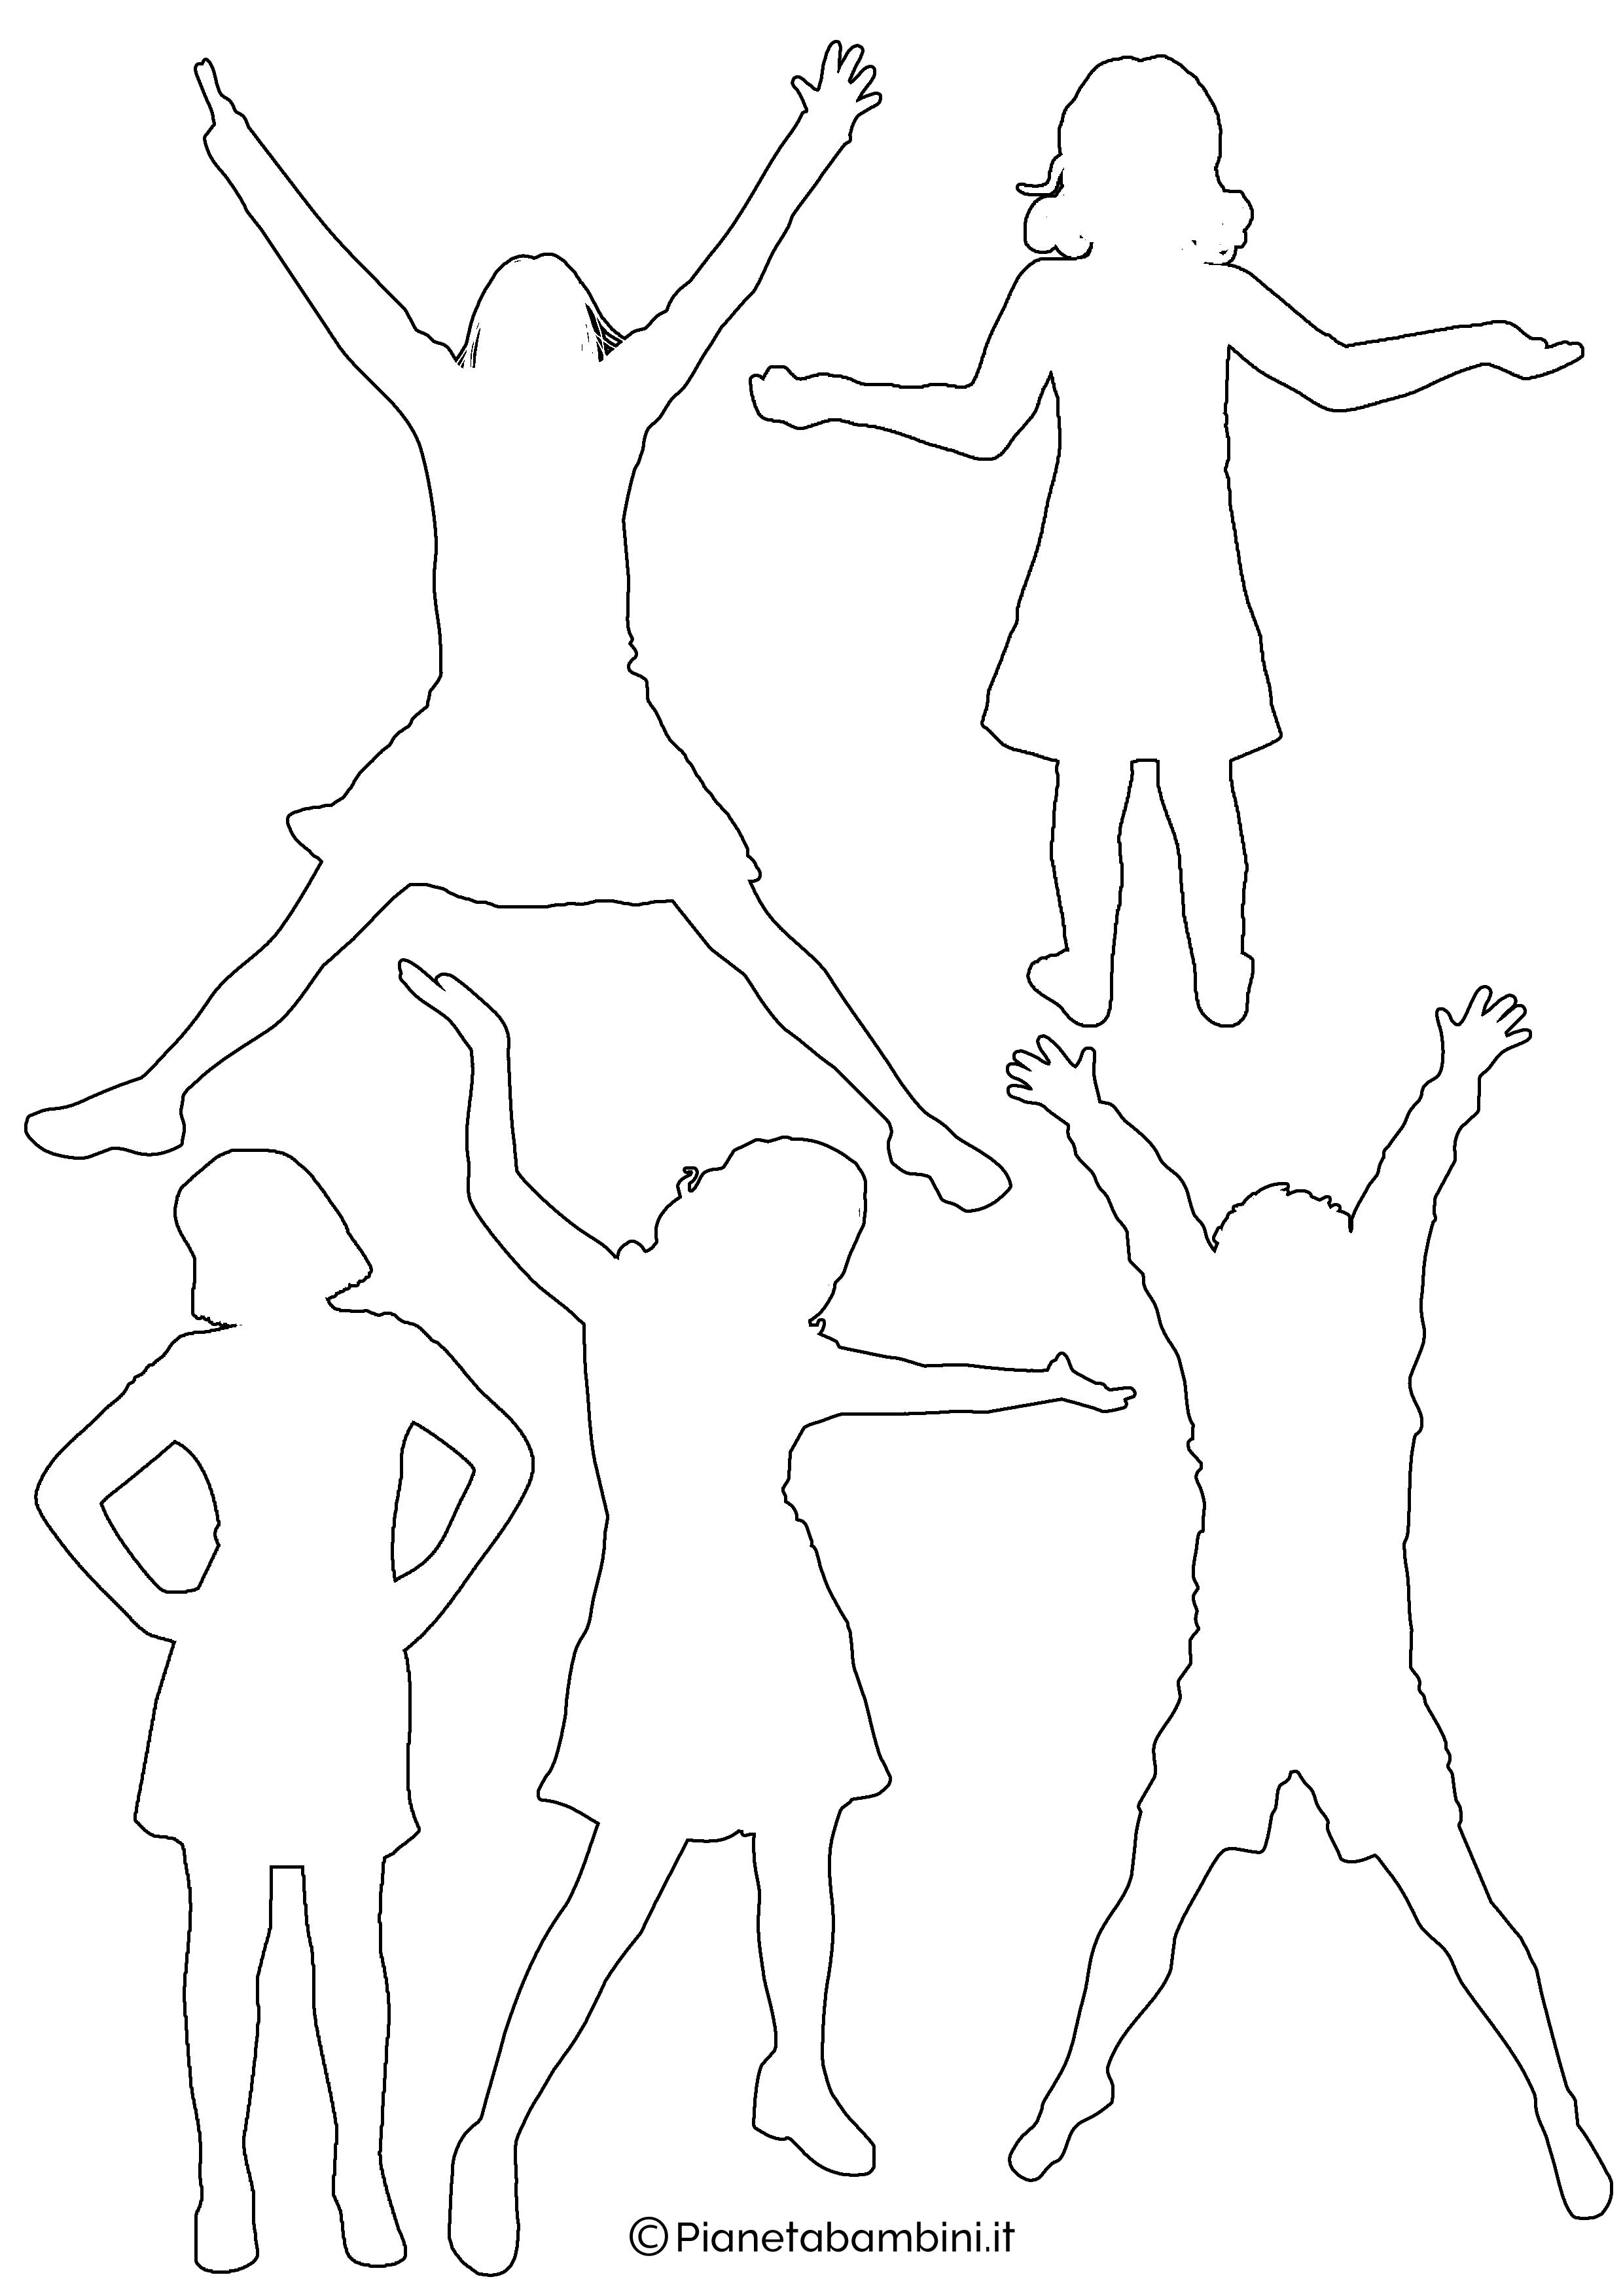 Sagome-Bambini-Medie-1